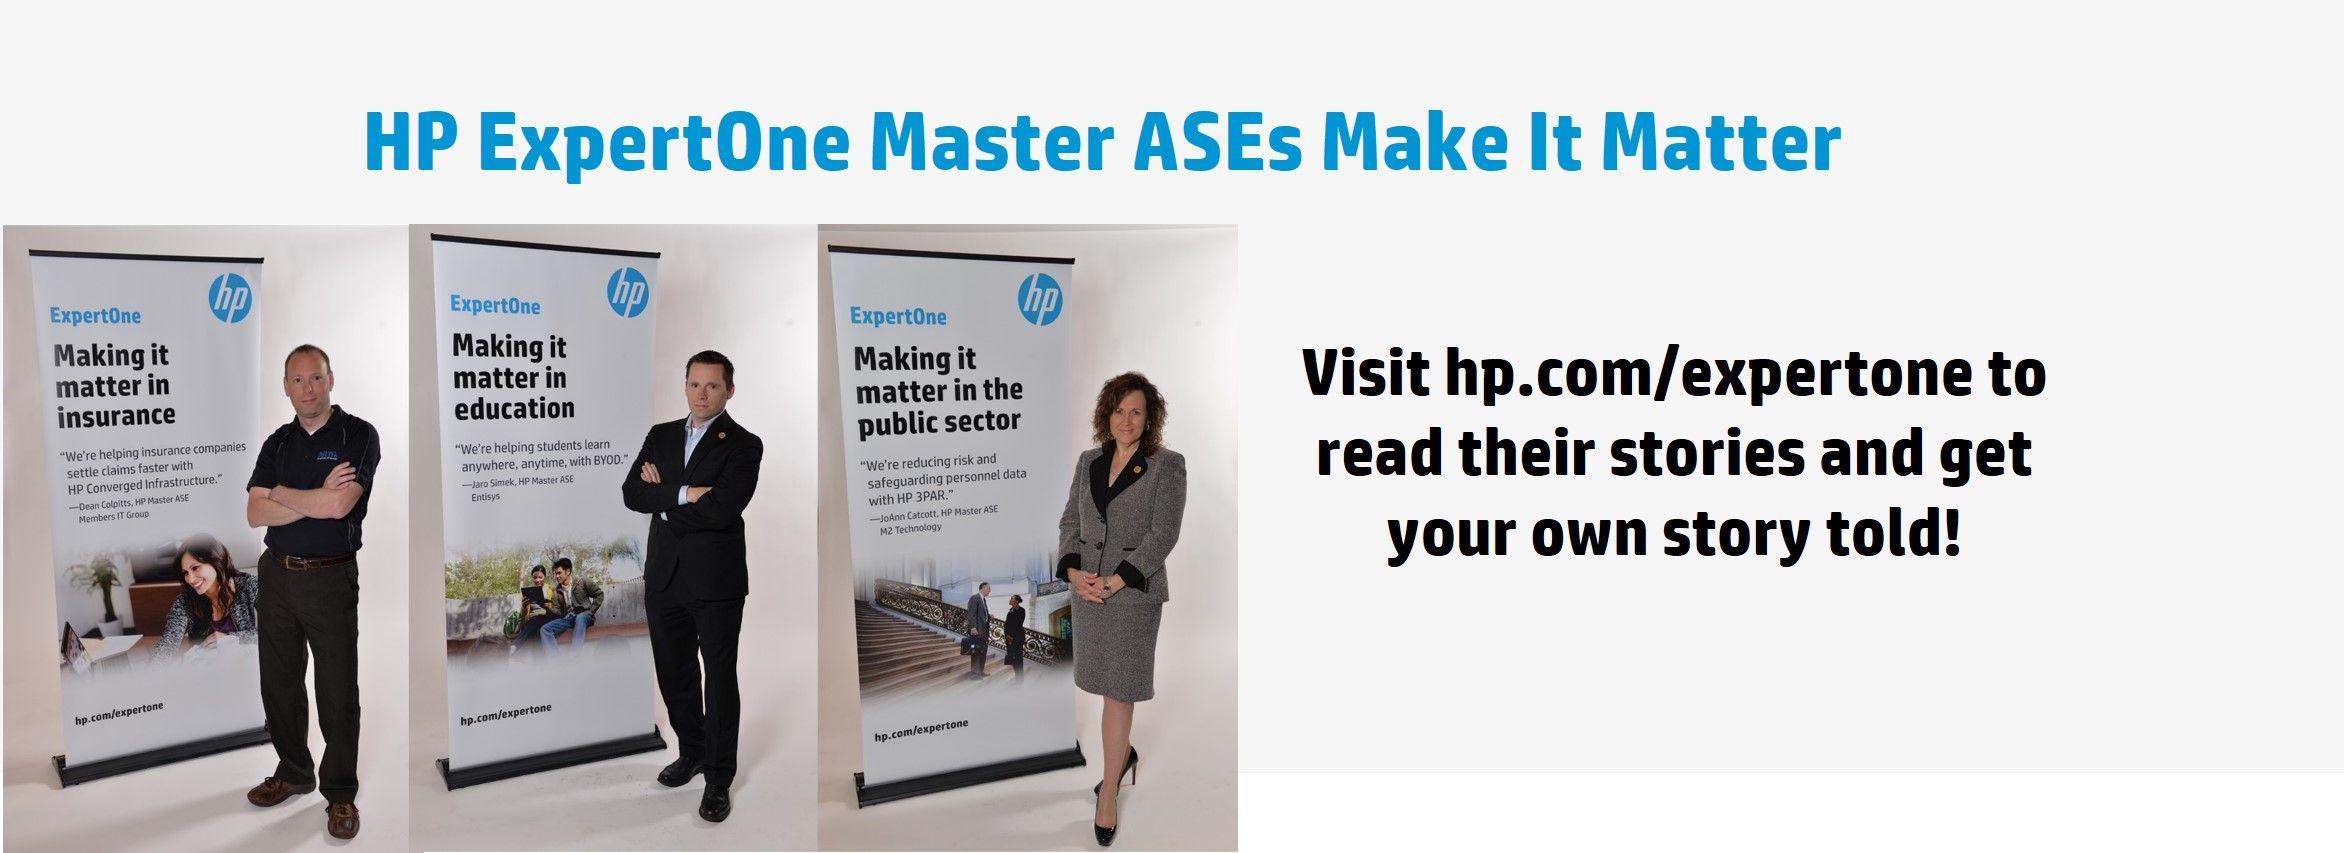 HP ExpertOne-Make It Matter-Certification-Master ASE-ASE.jpg